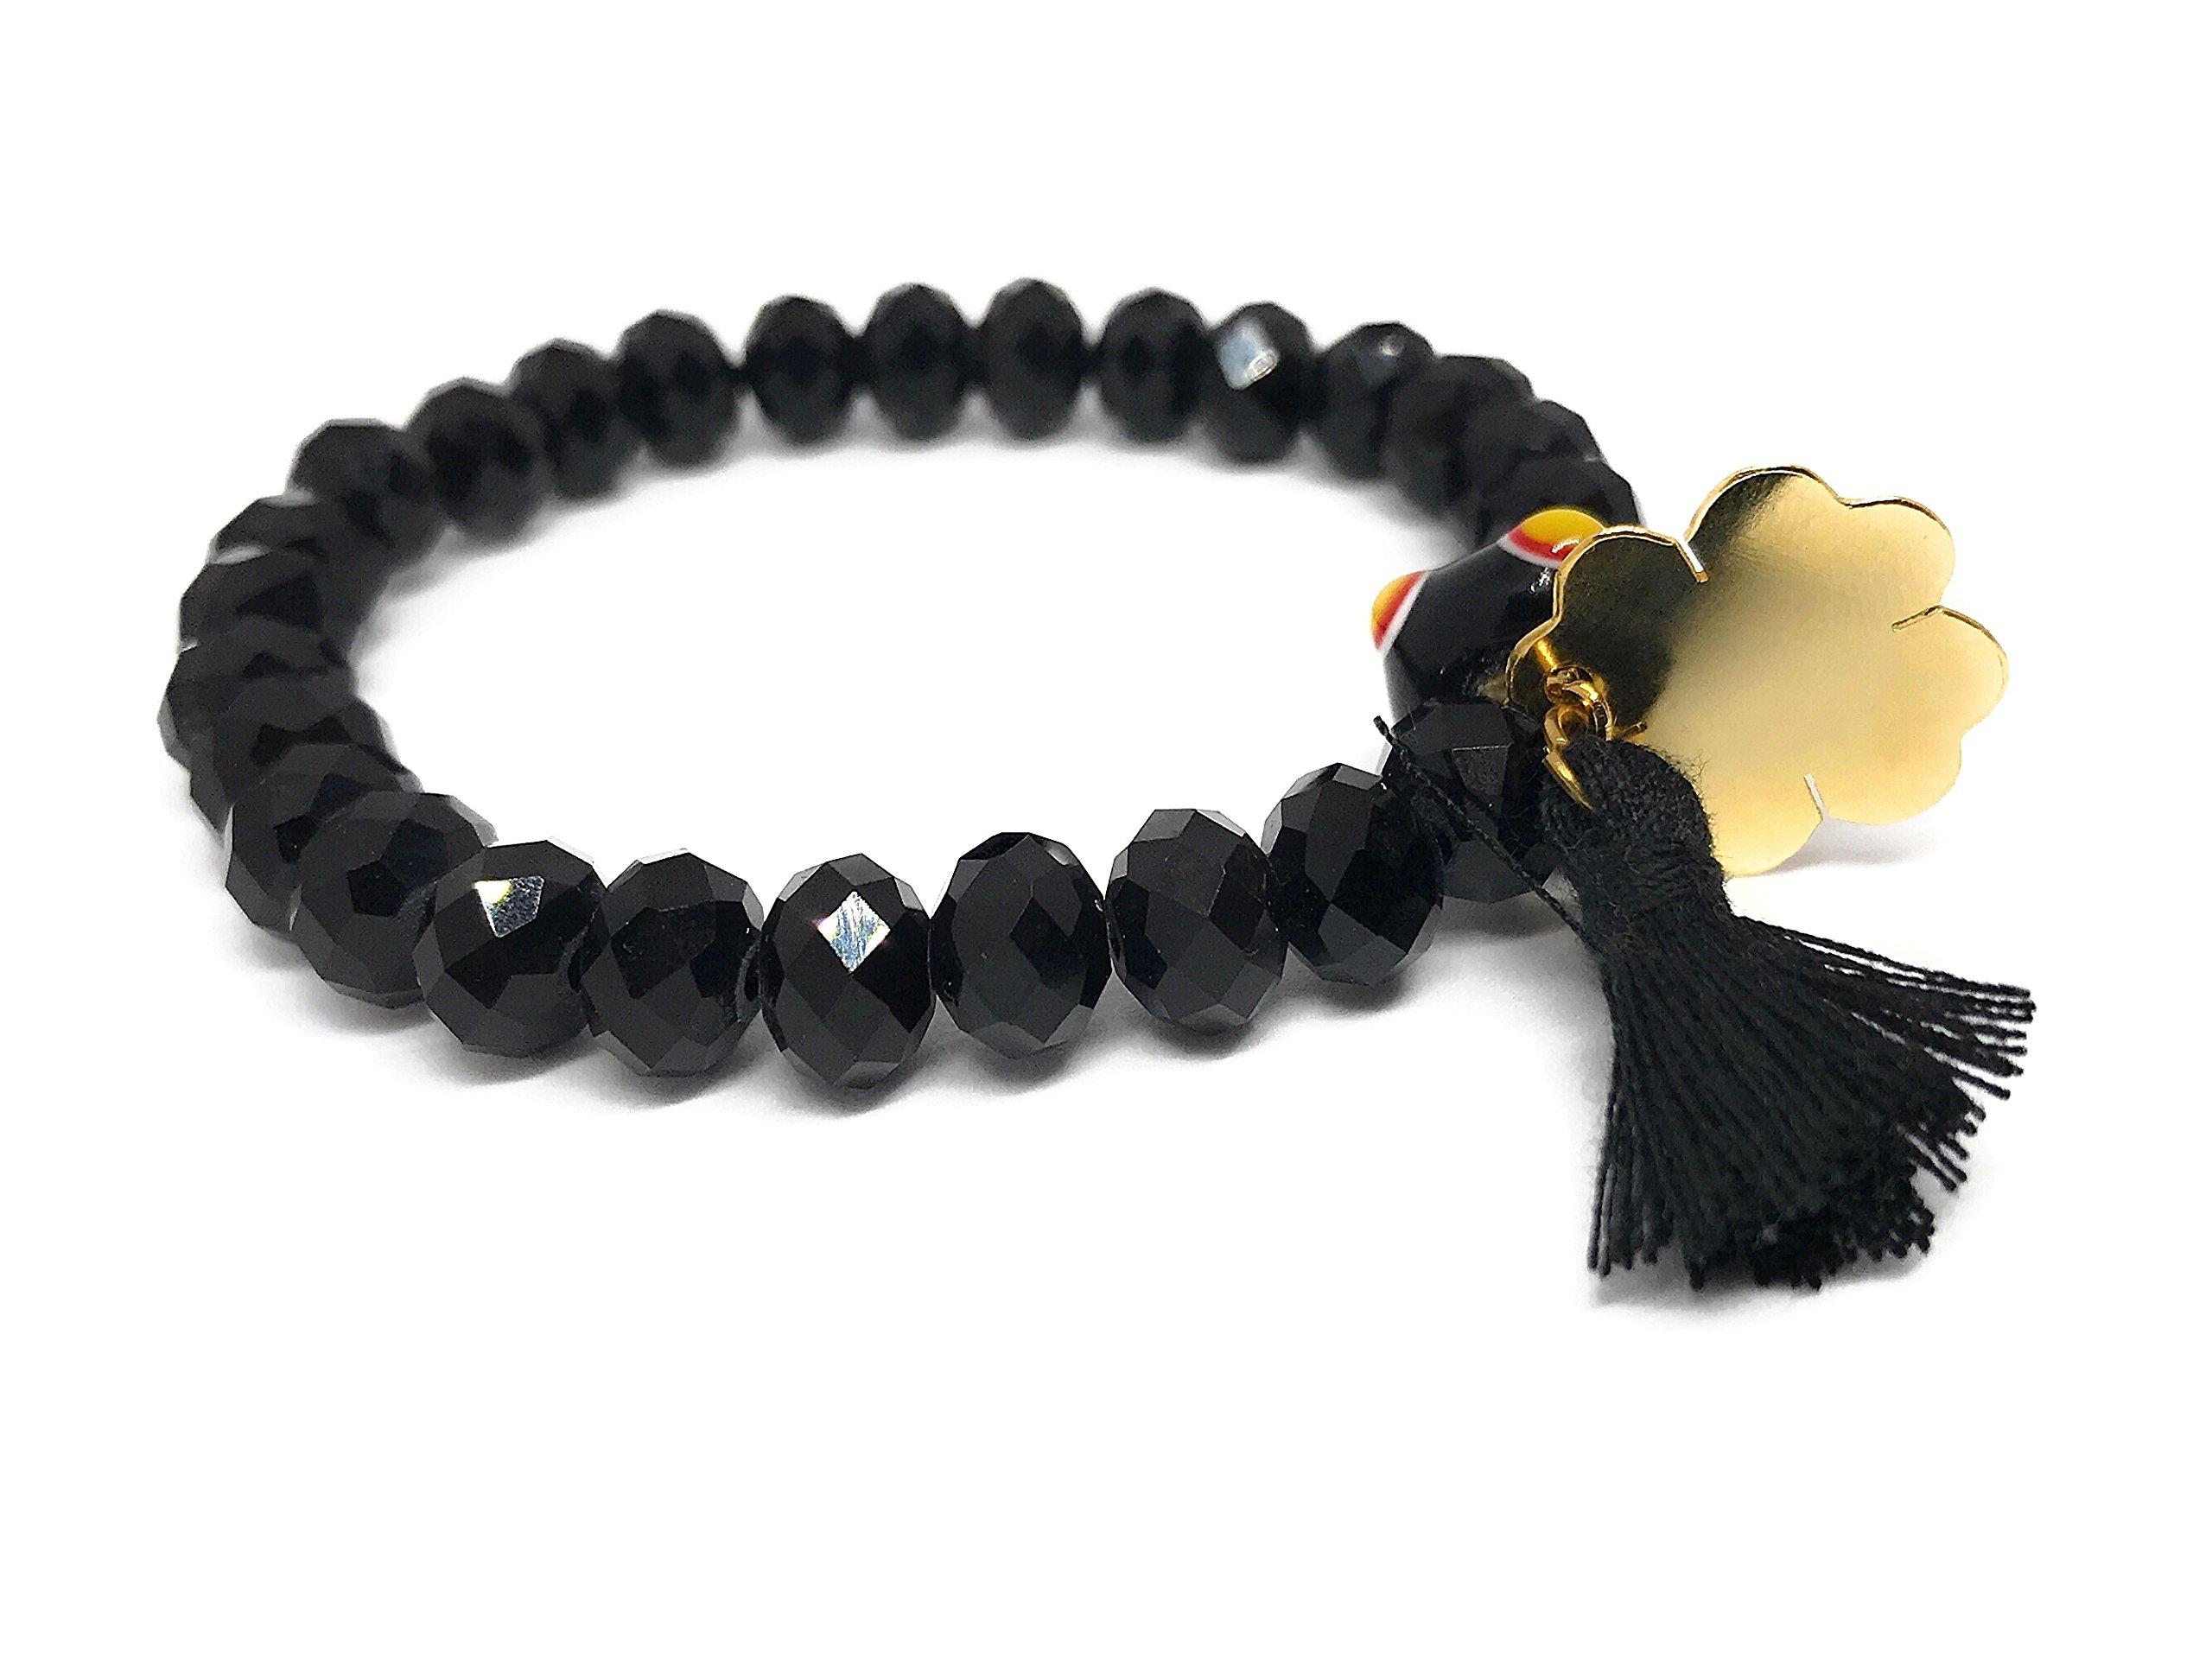 LESLIE BOULES Women Bracelet Murano Glass Crystal Beads Boho Jewelry